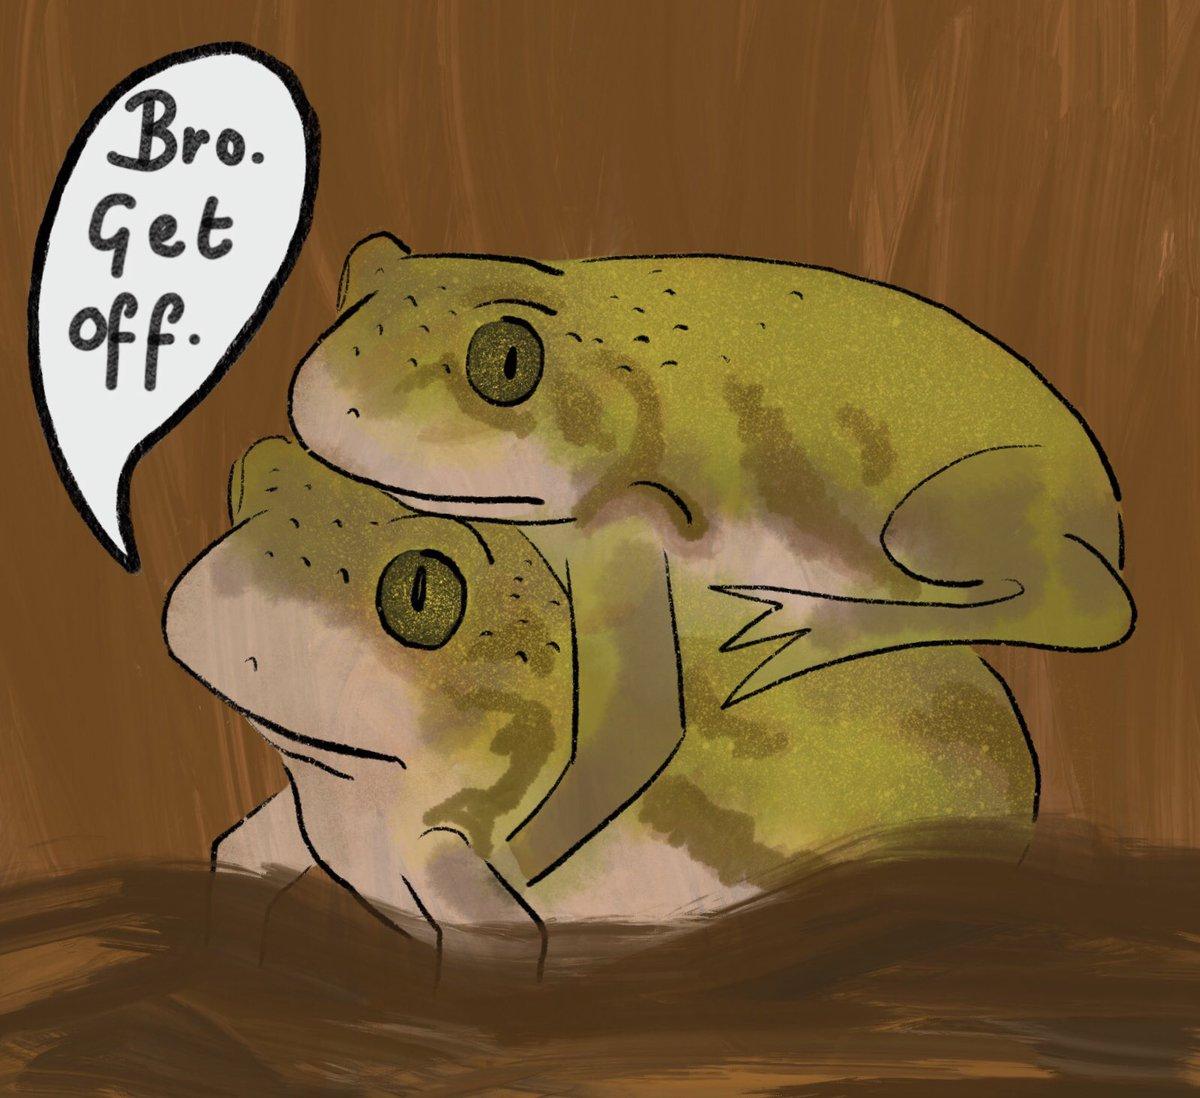 Bro. Get off. @AnimalAlphabets #AnimalAlphabets #XanthophryneTigerina #toad #animal #illustration #digitalart #procreate #justacoupleofguys<br>http://pic.twitter.com/BhfvPkMDDY